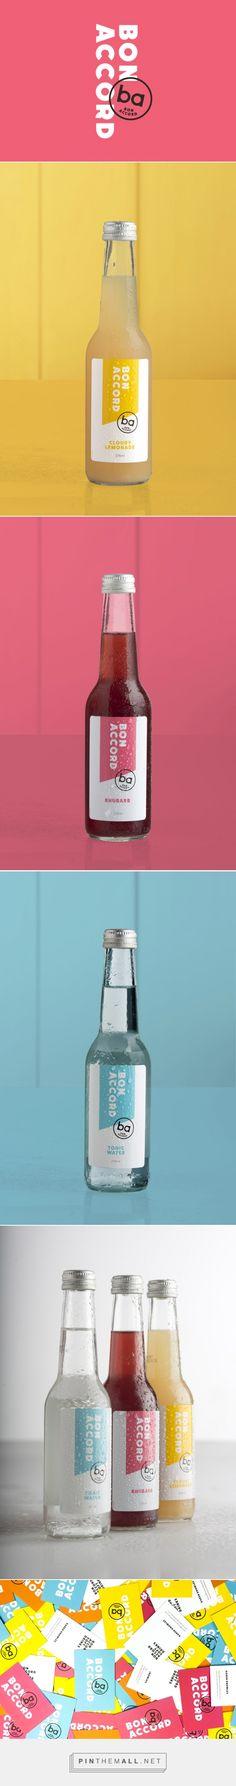 Bon Accord Beverage Packaging by Creative Graffix | Fivestar Branding Agency – Design and Branding Agency & Inspiration Gallery